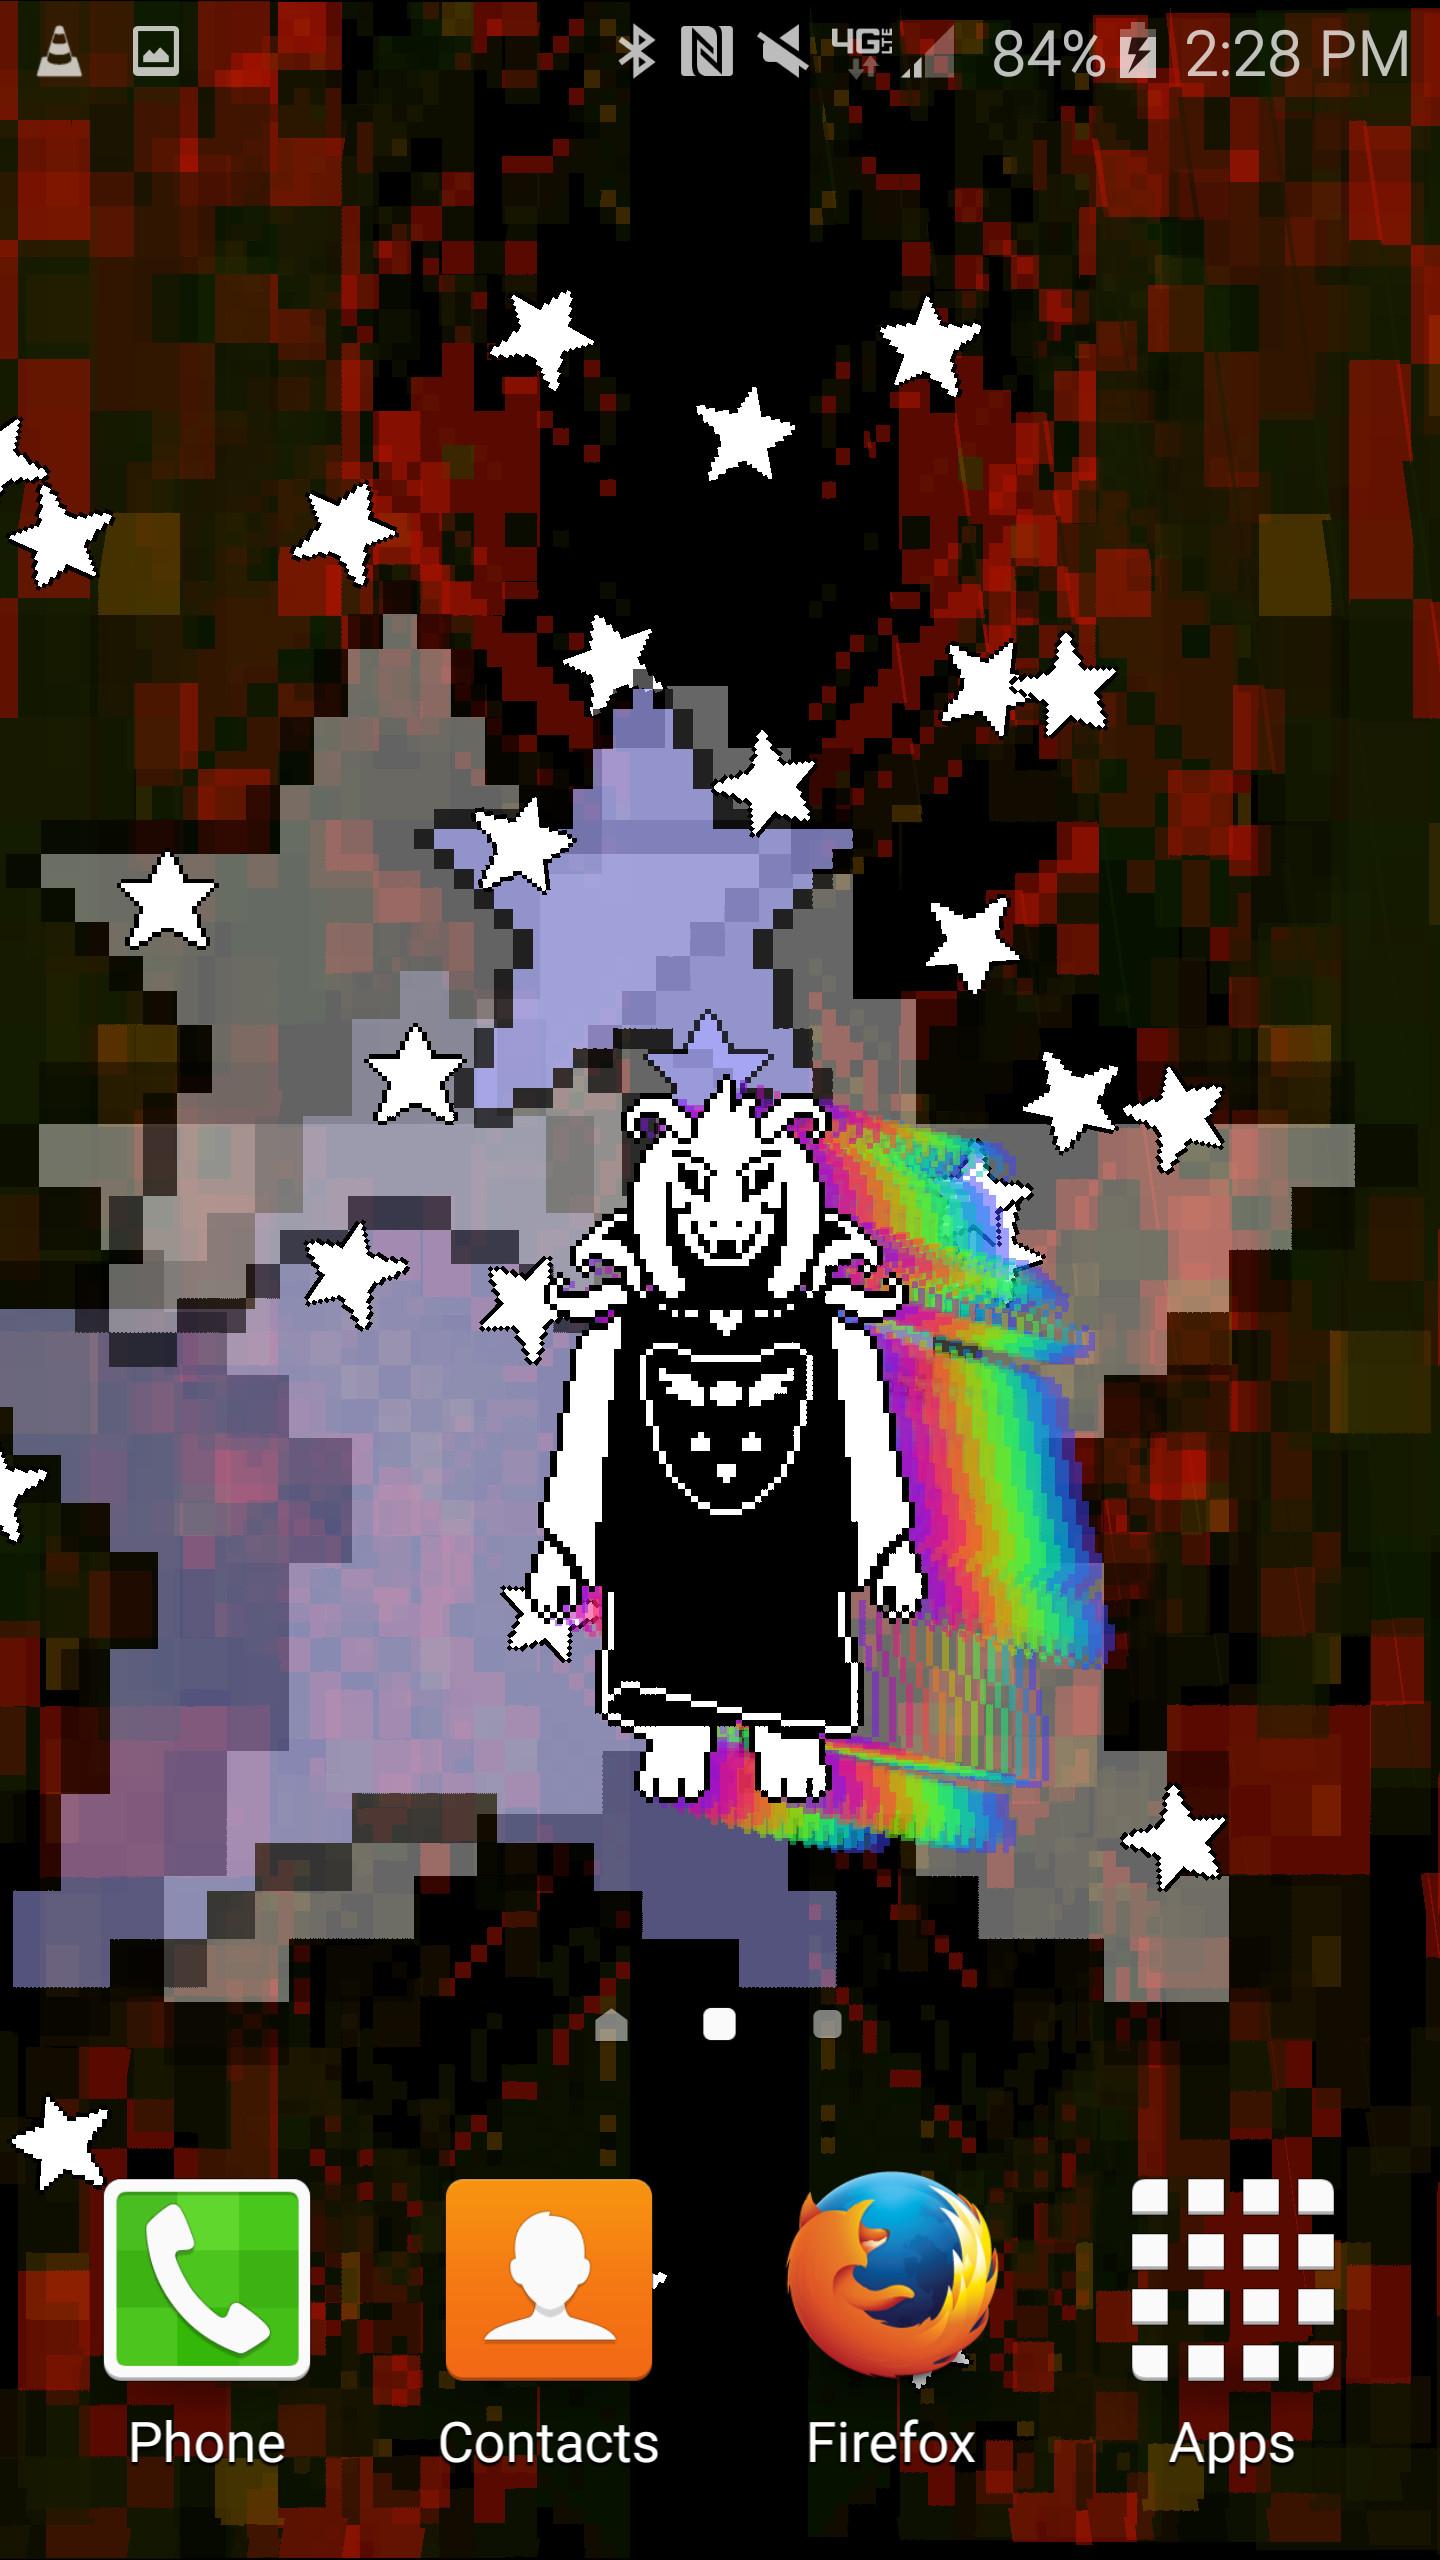 1440x2560 Asriel Dreemur, God of Hyperdeath Live Wallpaper - Album on Imgur